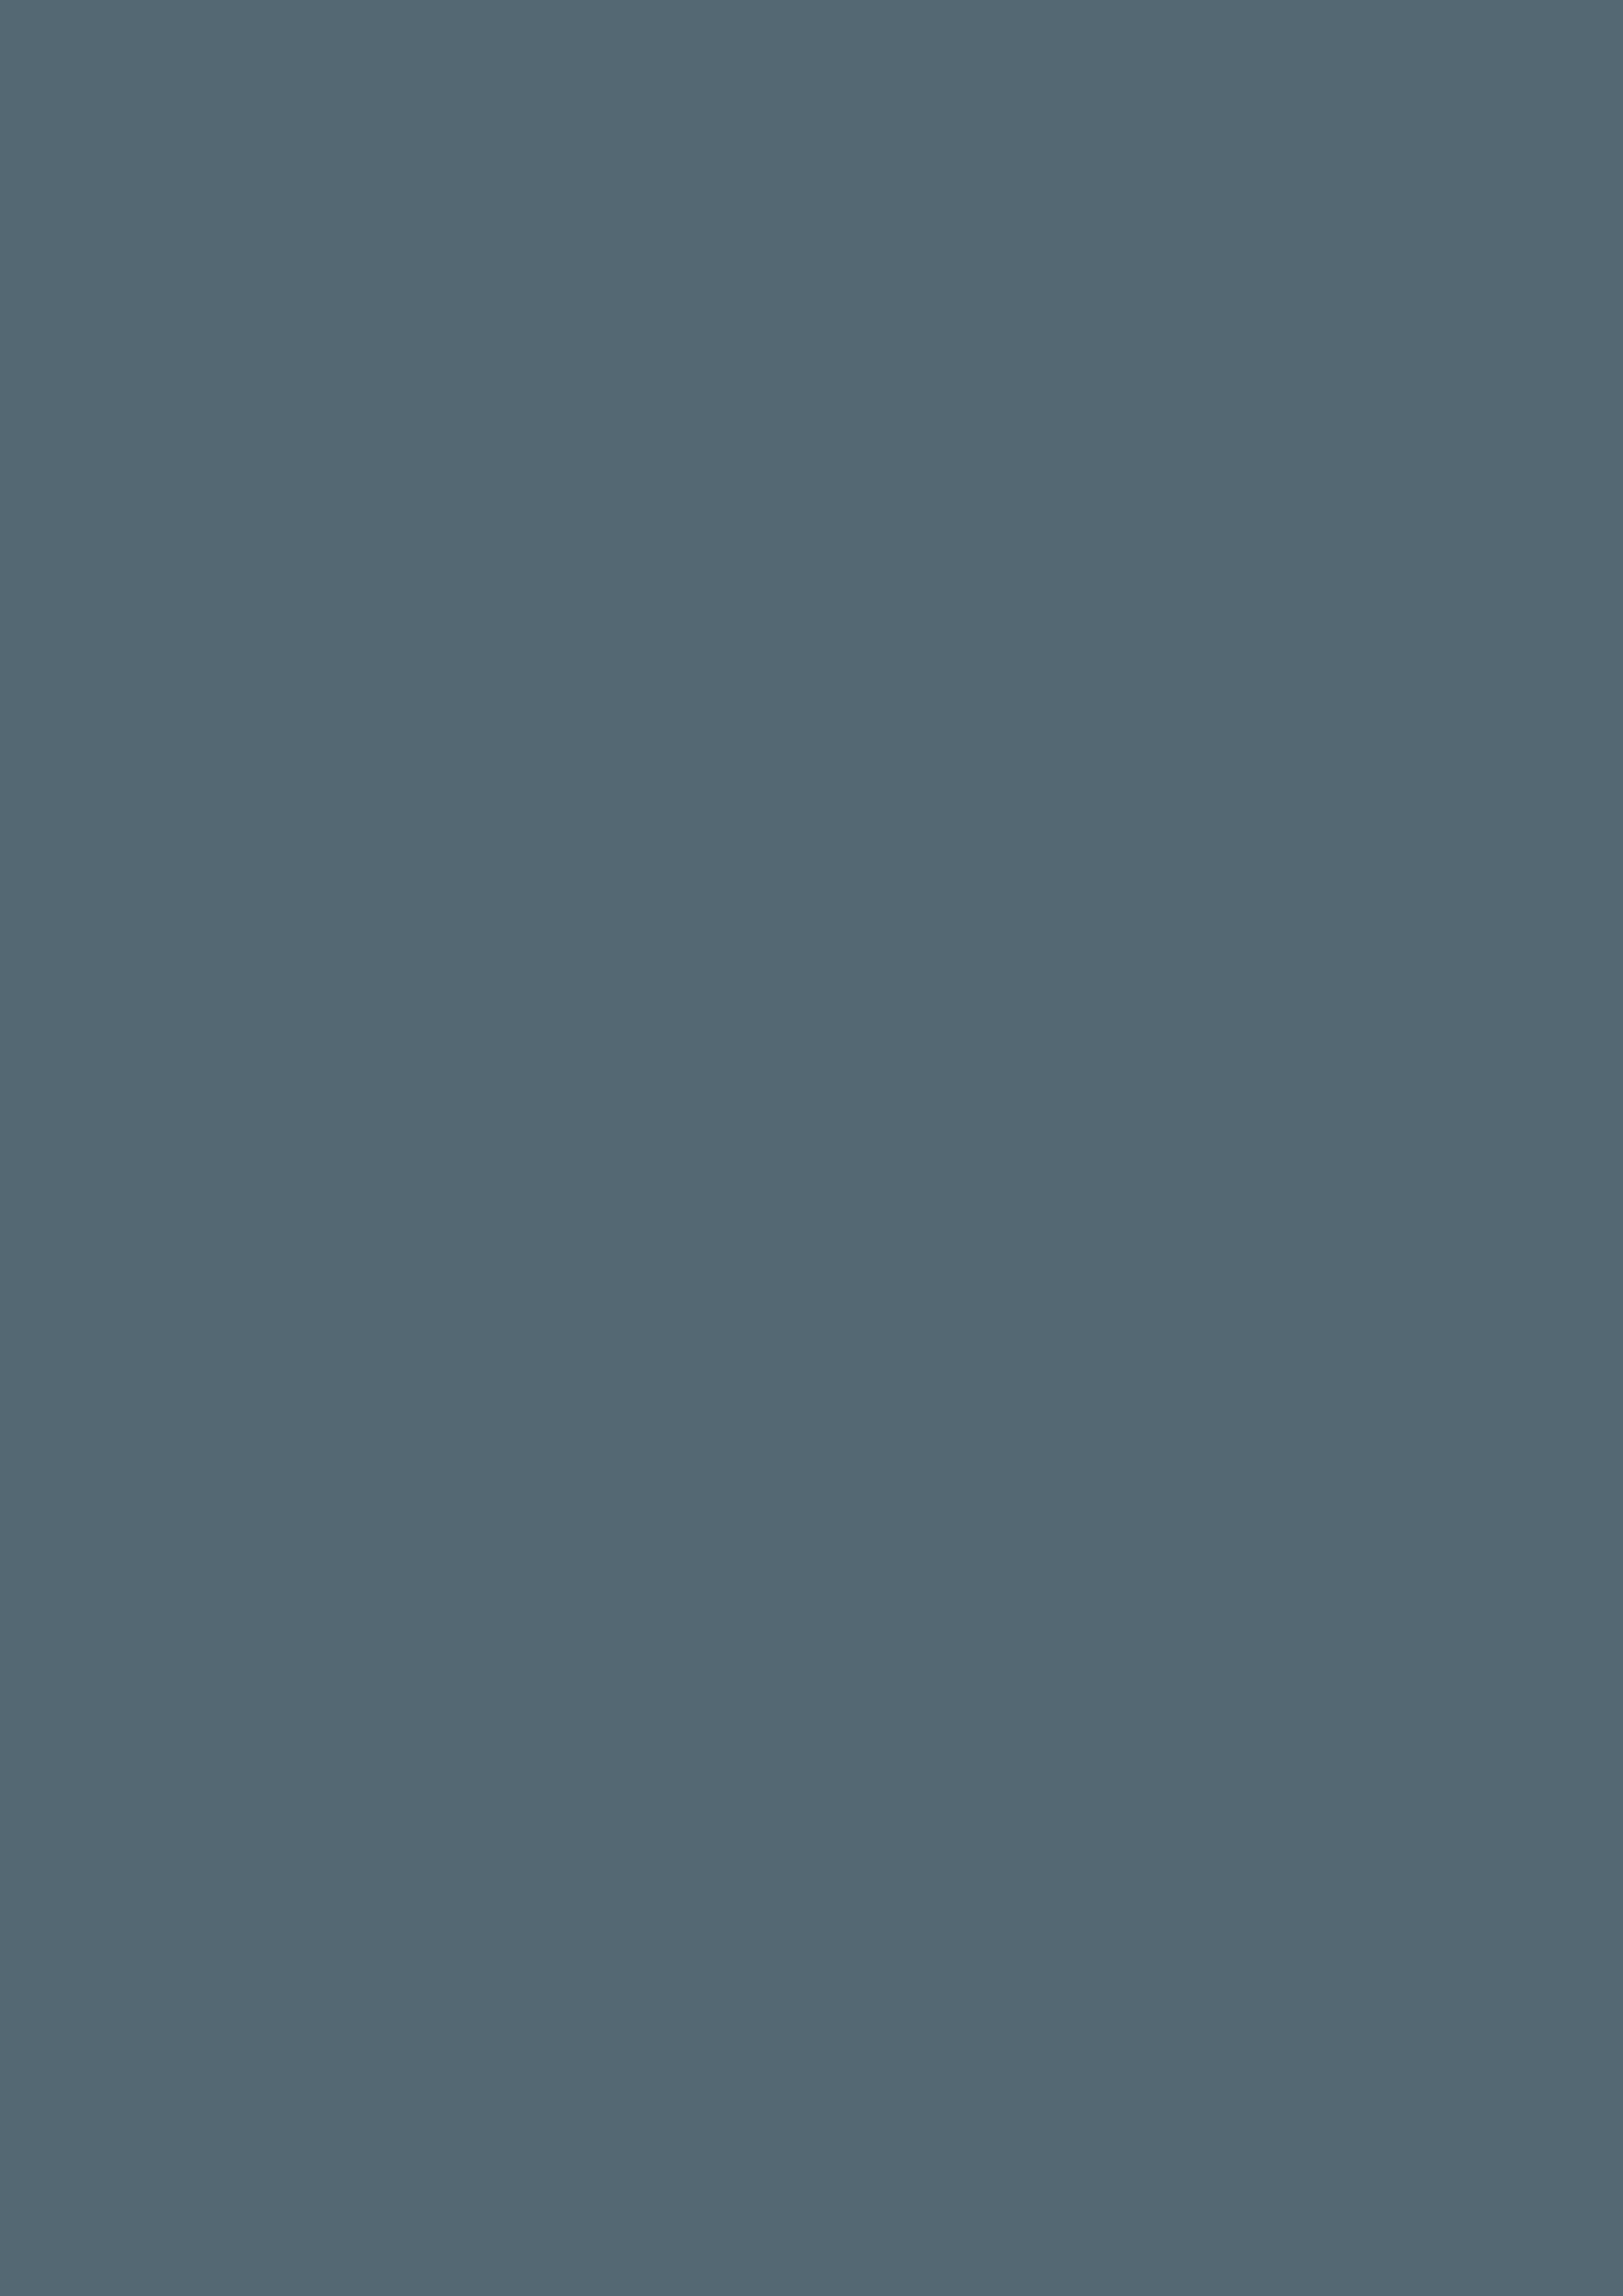 2480x3508 Cadet Solid Color Background